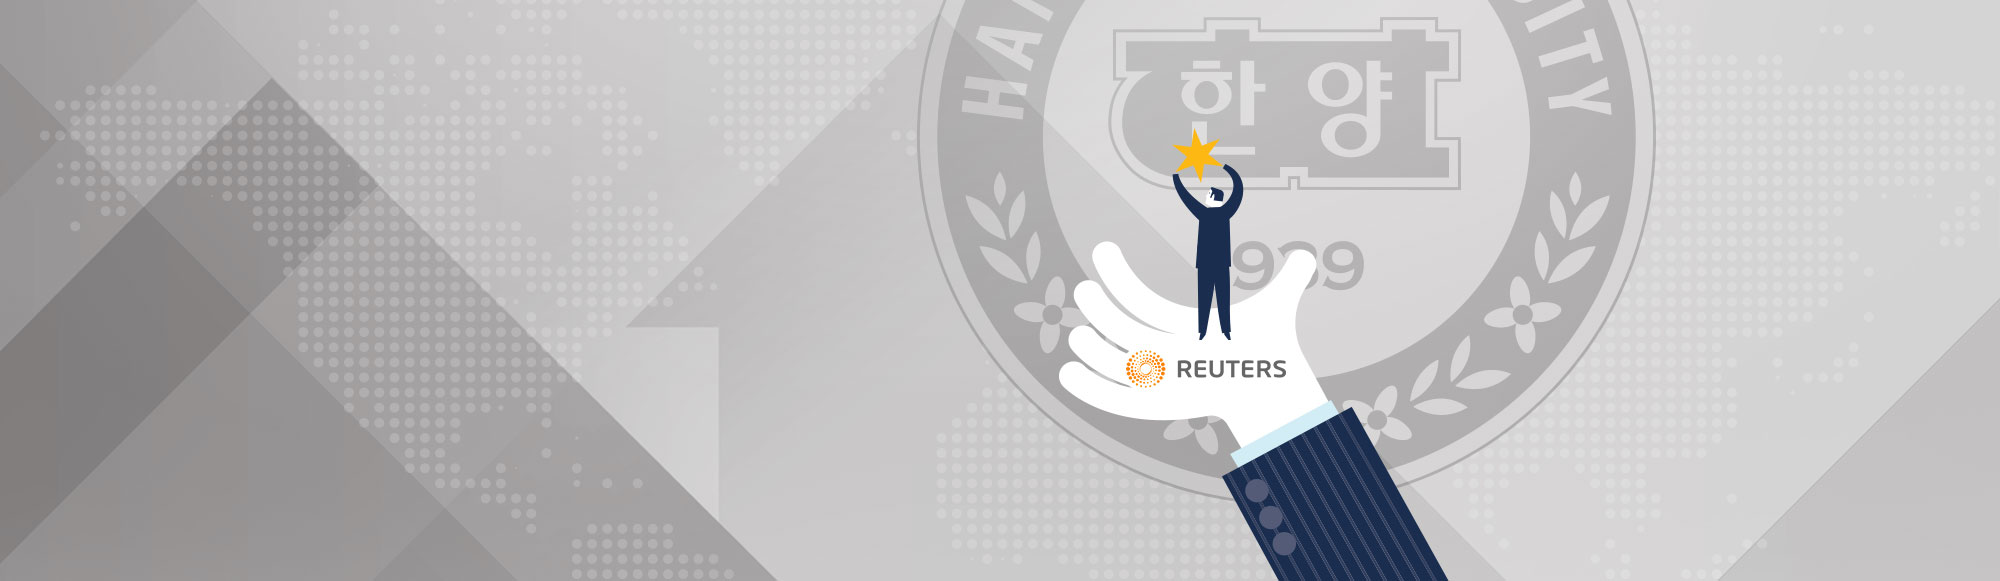 Reuters 2017 아시아 최고 혁신대학